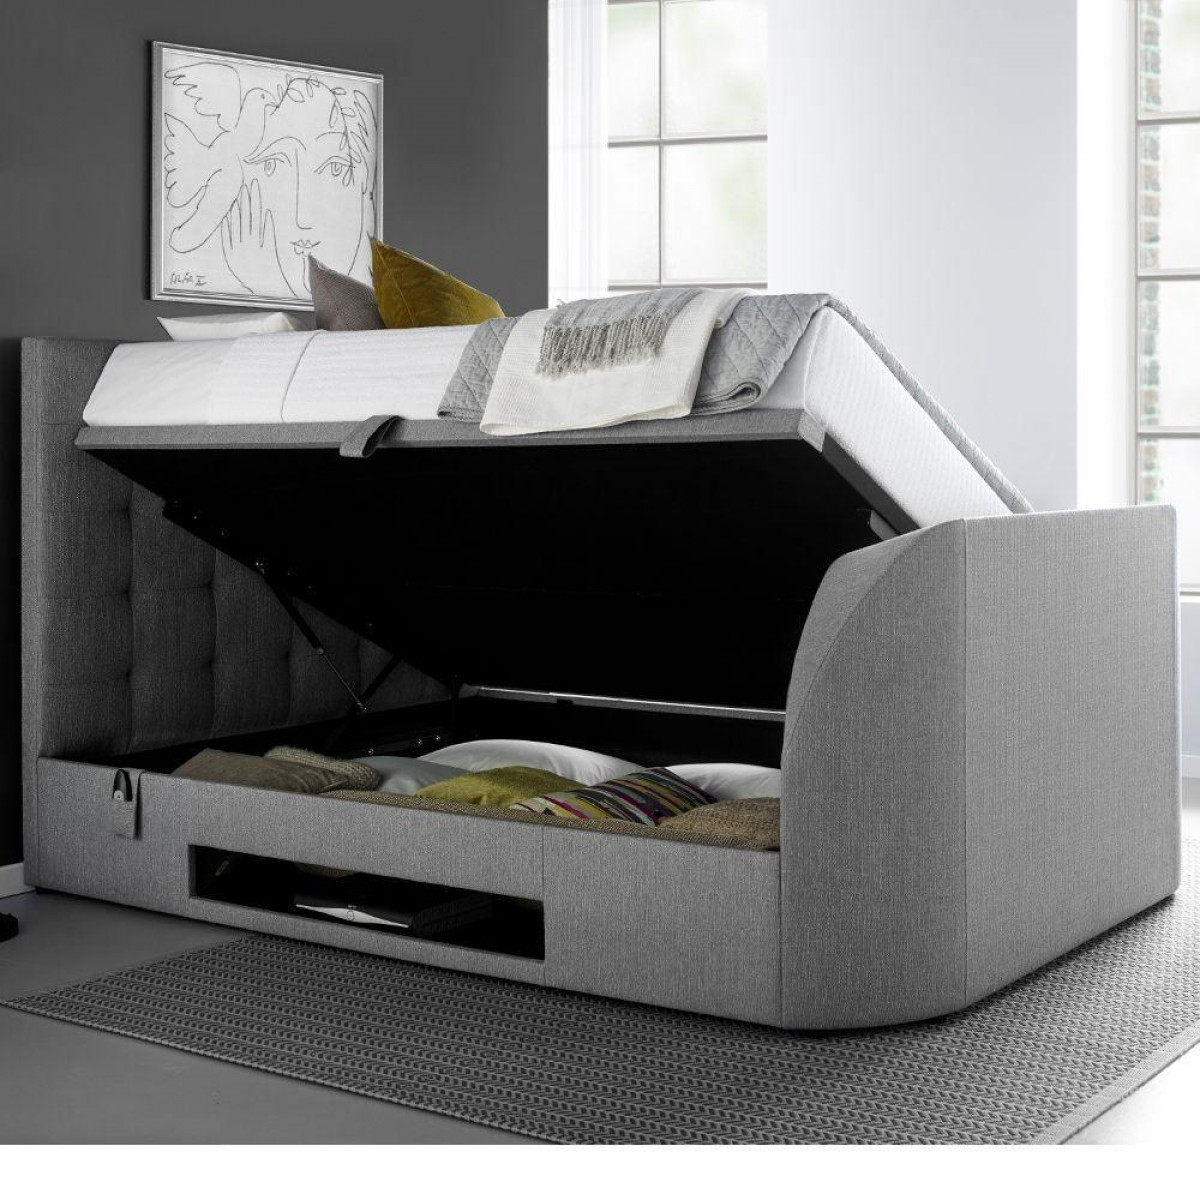 Miraculous Barnard Grey Fabric Ottoman Tv Bed Andrewgaddart Wooden Chair Designs For Living Room Andrewgaddartcom